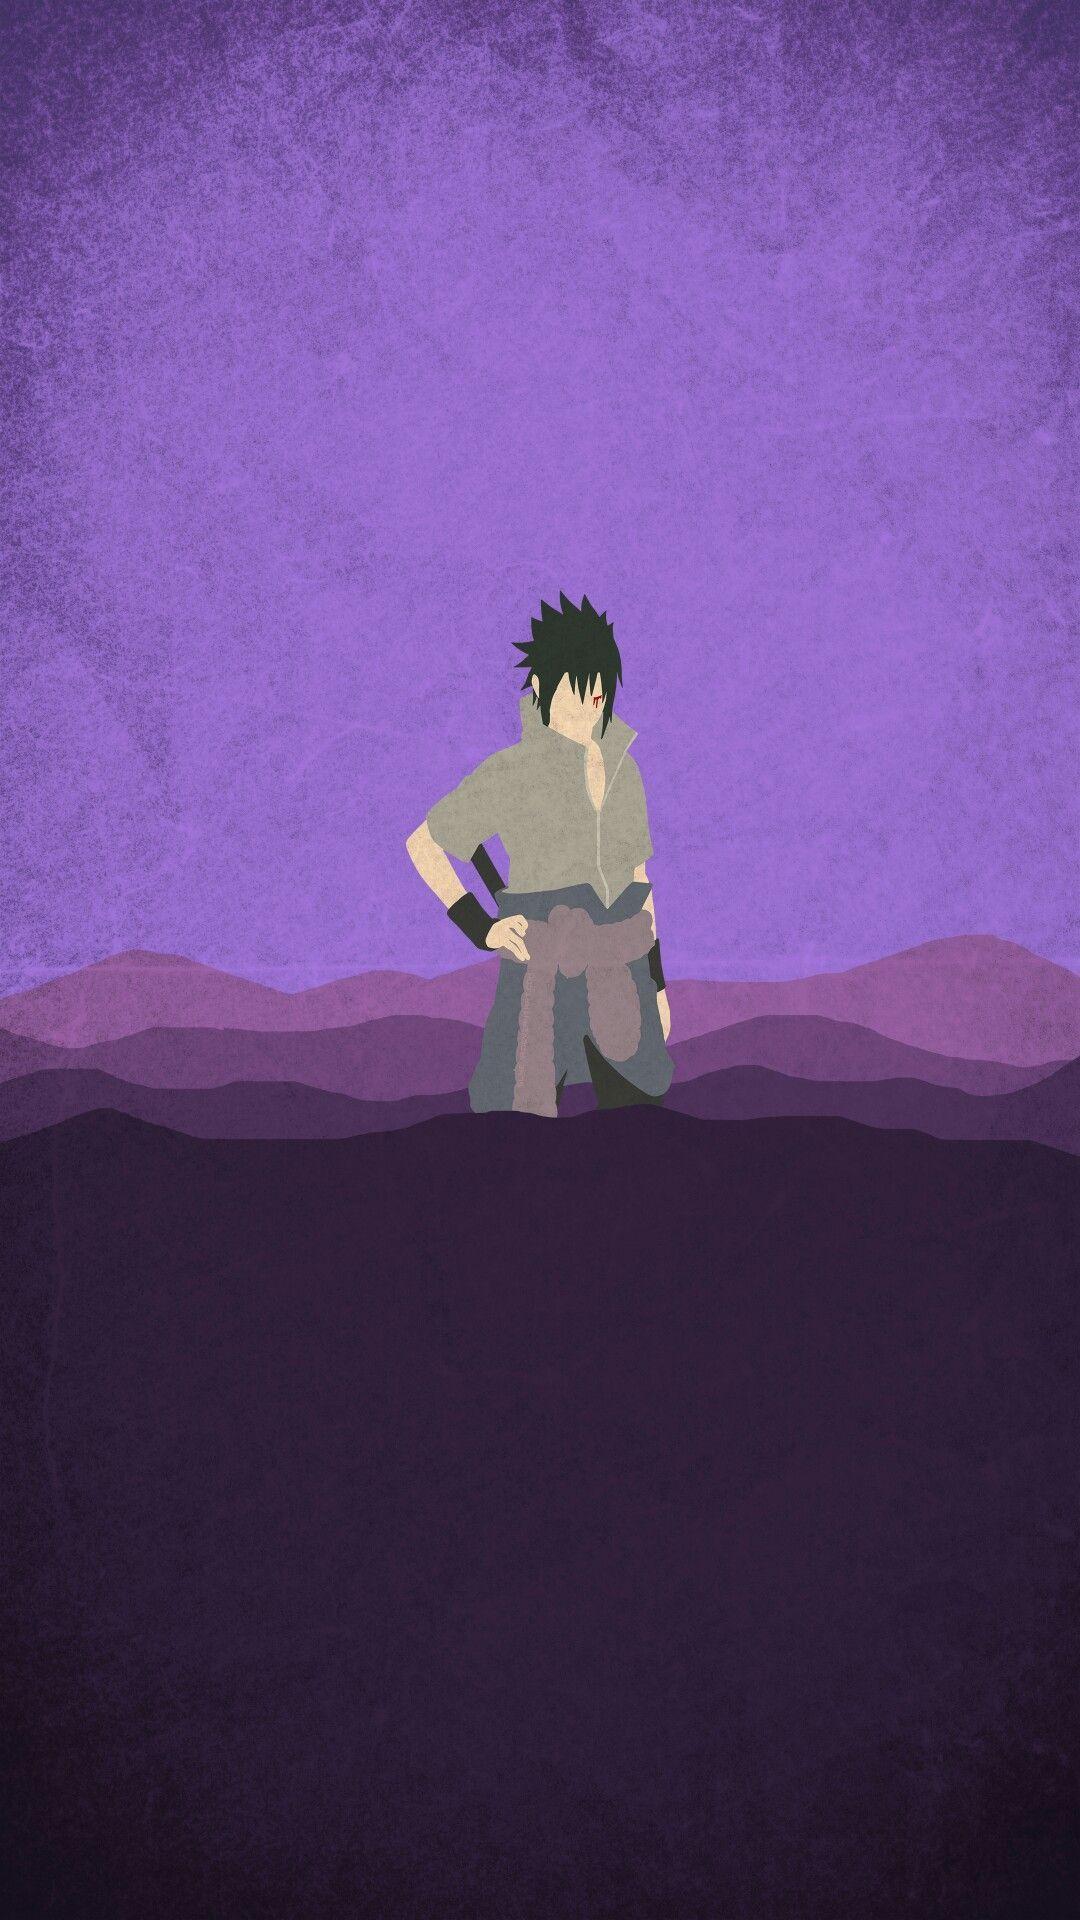 Sasuke Iphone Wallpaper Posted By Ethan Peltier